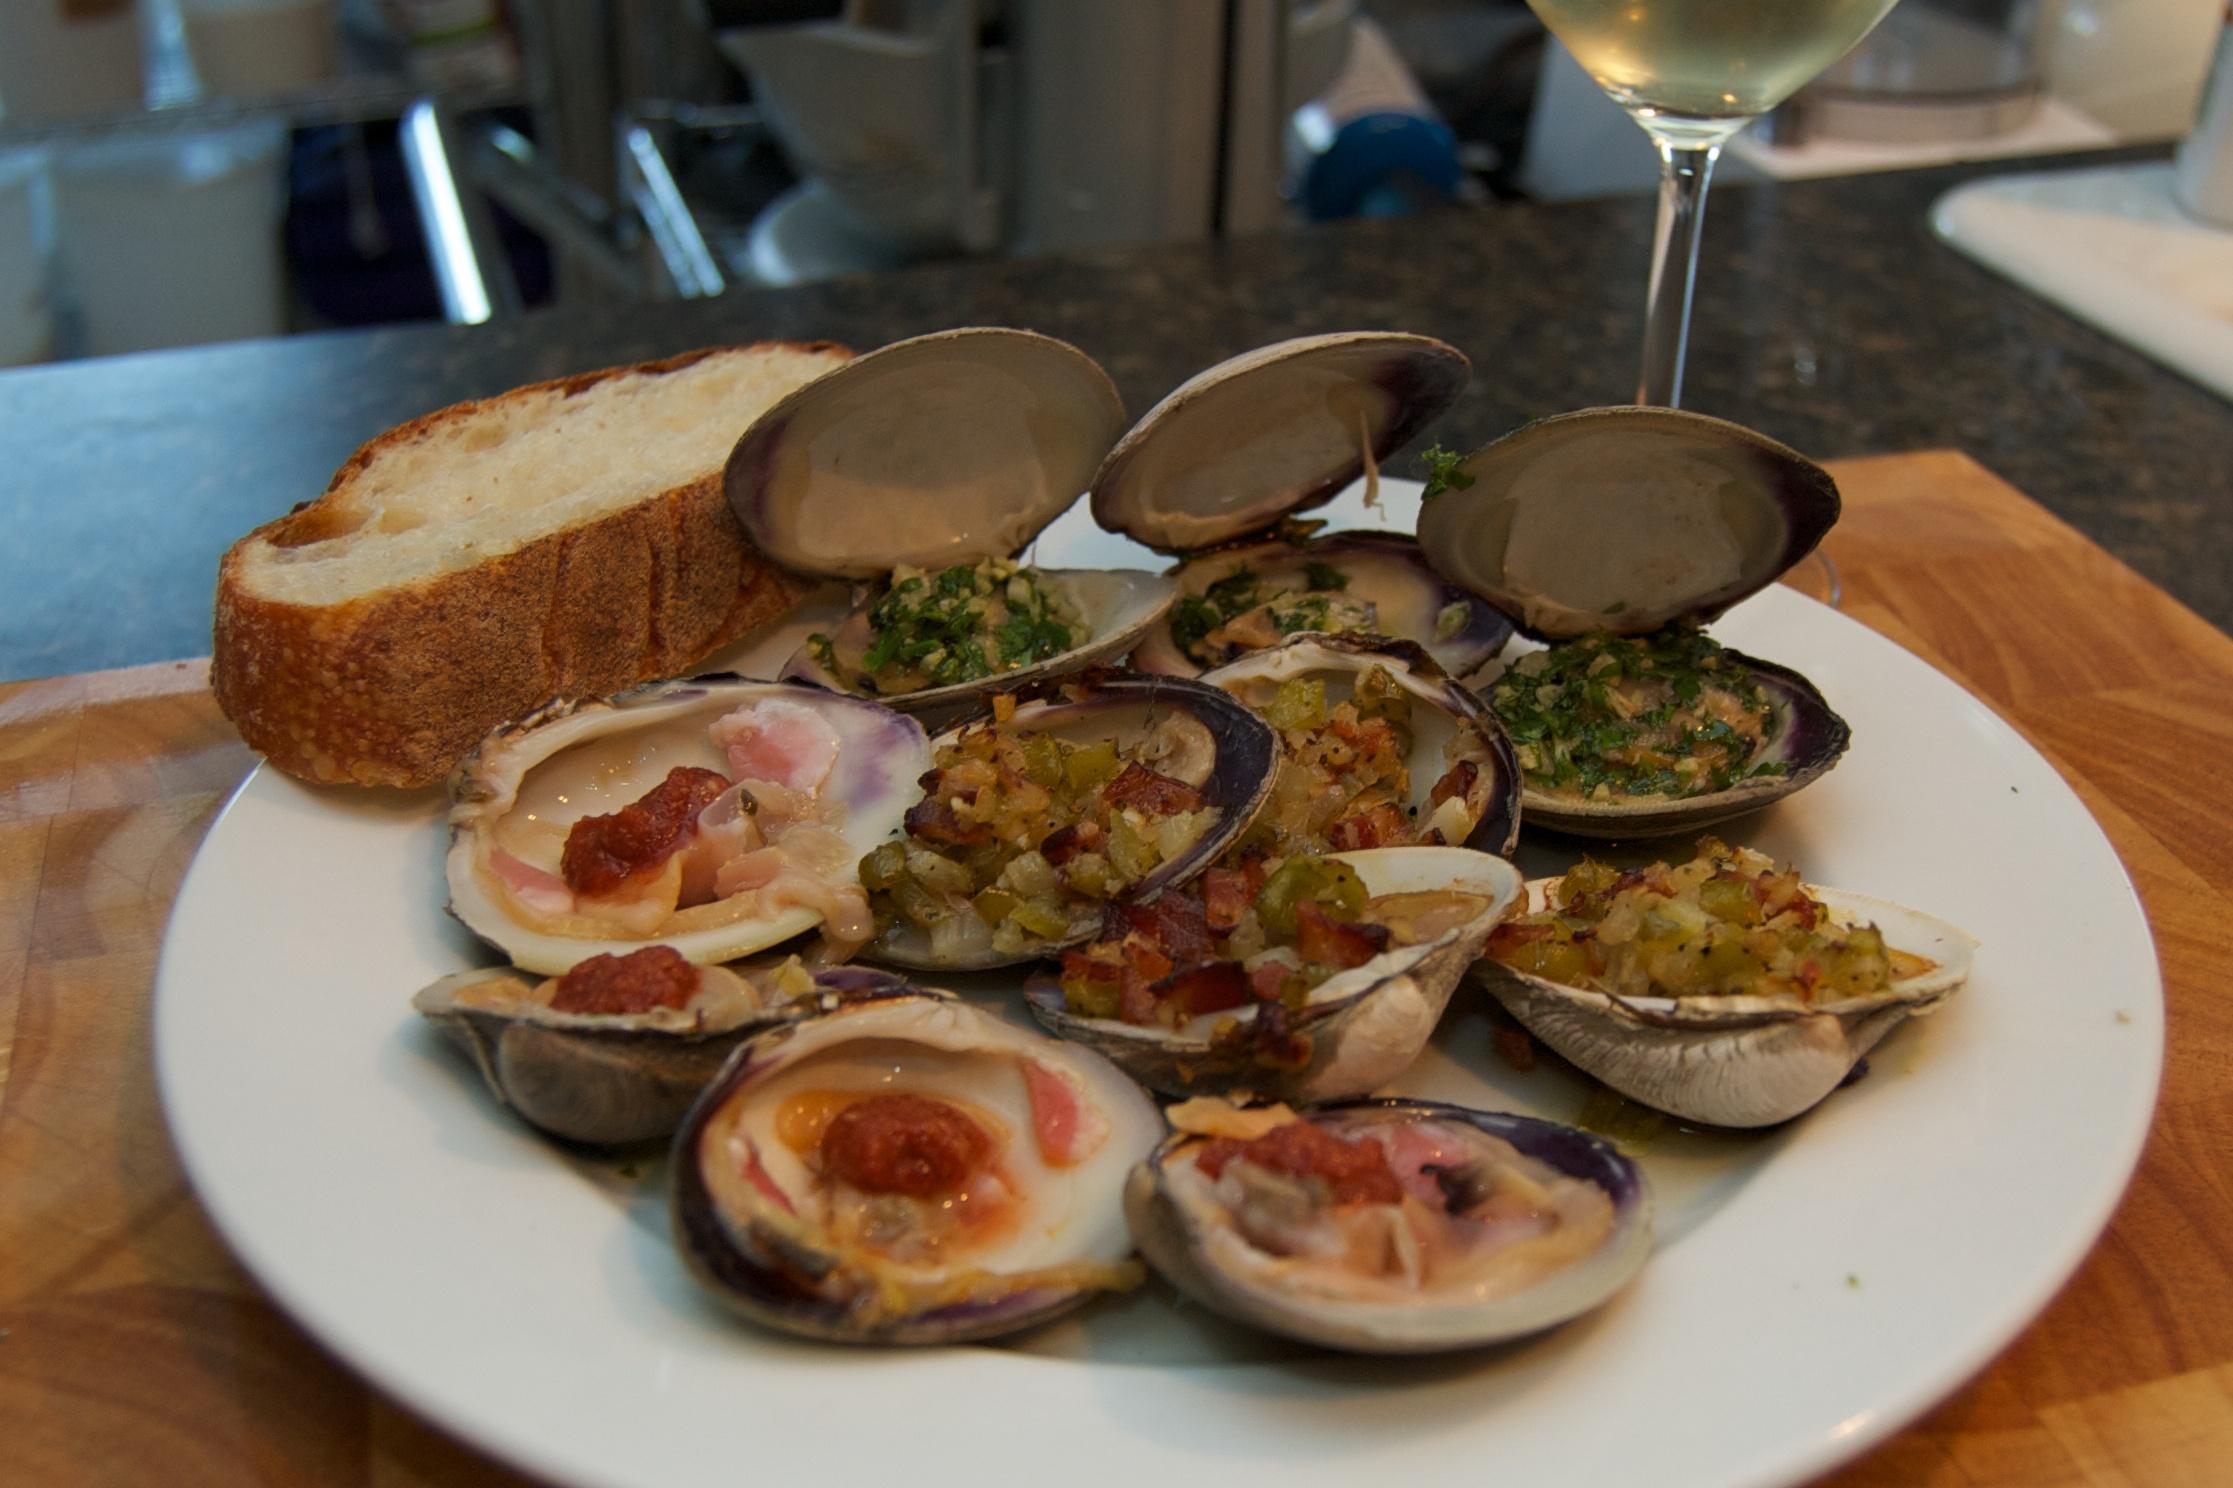 http://blog.rickk.com/food/2010/09/11/clams2.jpg